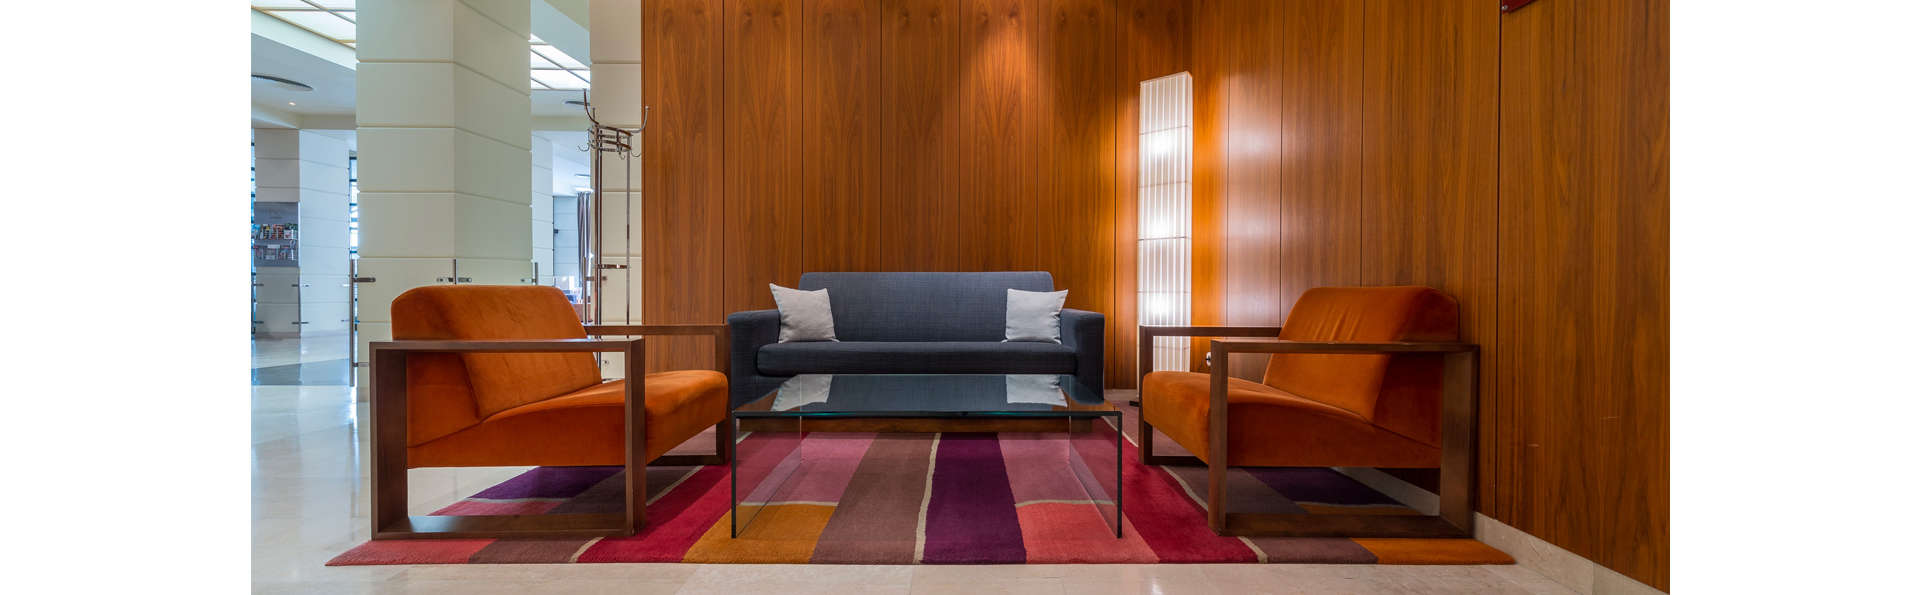 K+K Hotel Opera - EDIT_LOBBY_01.jpg